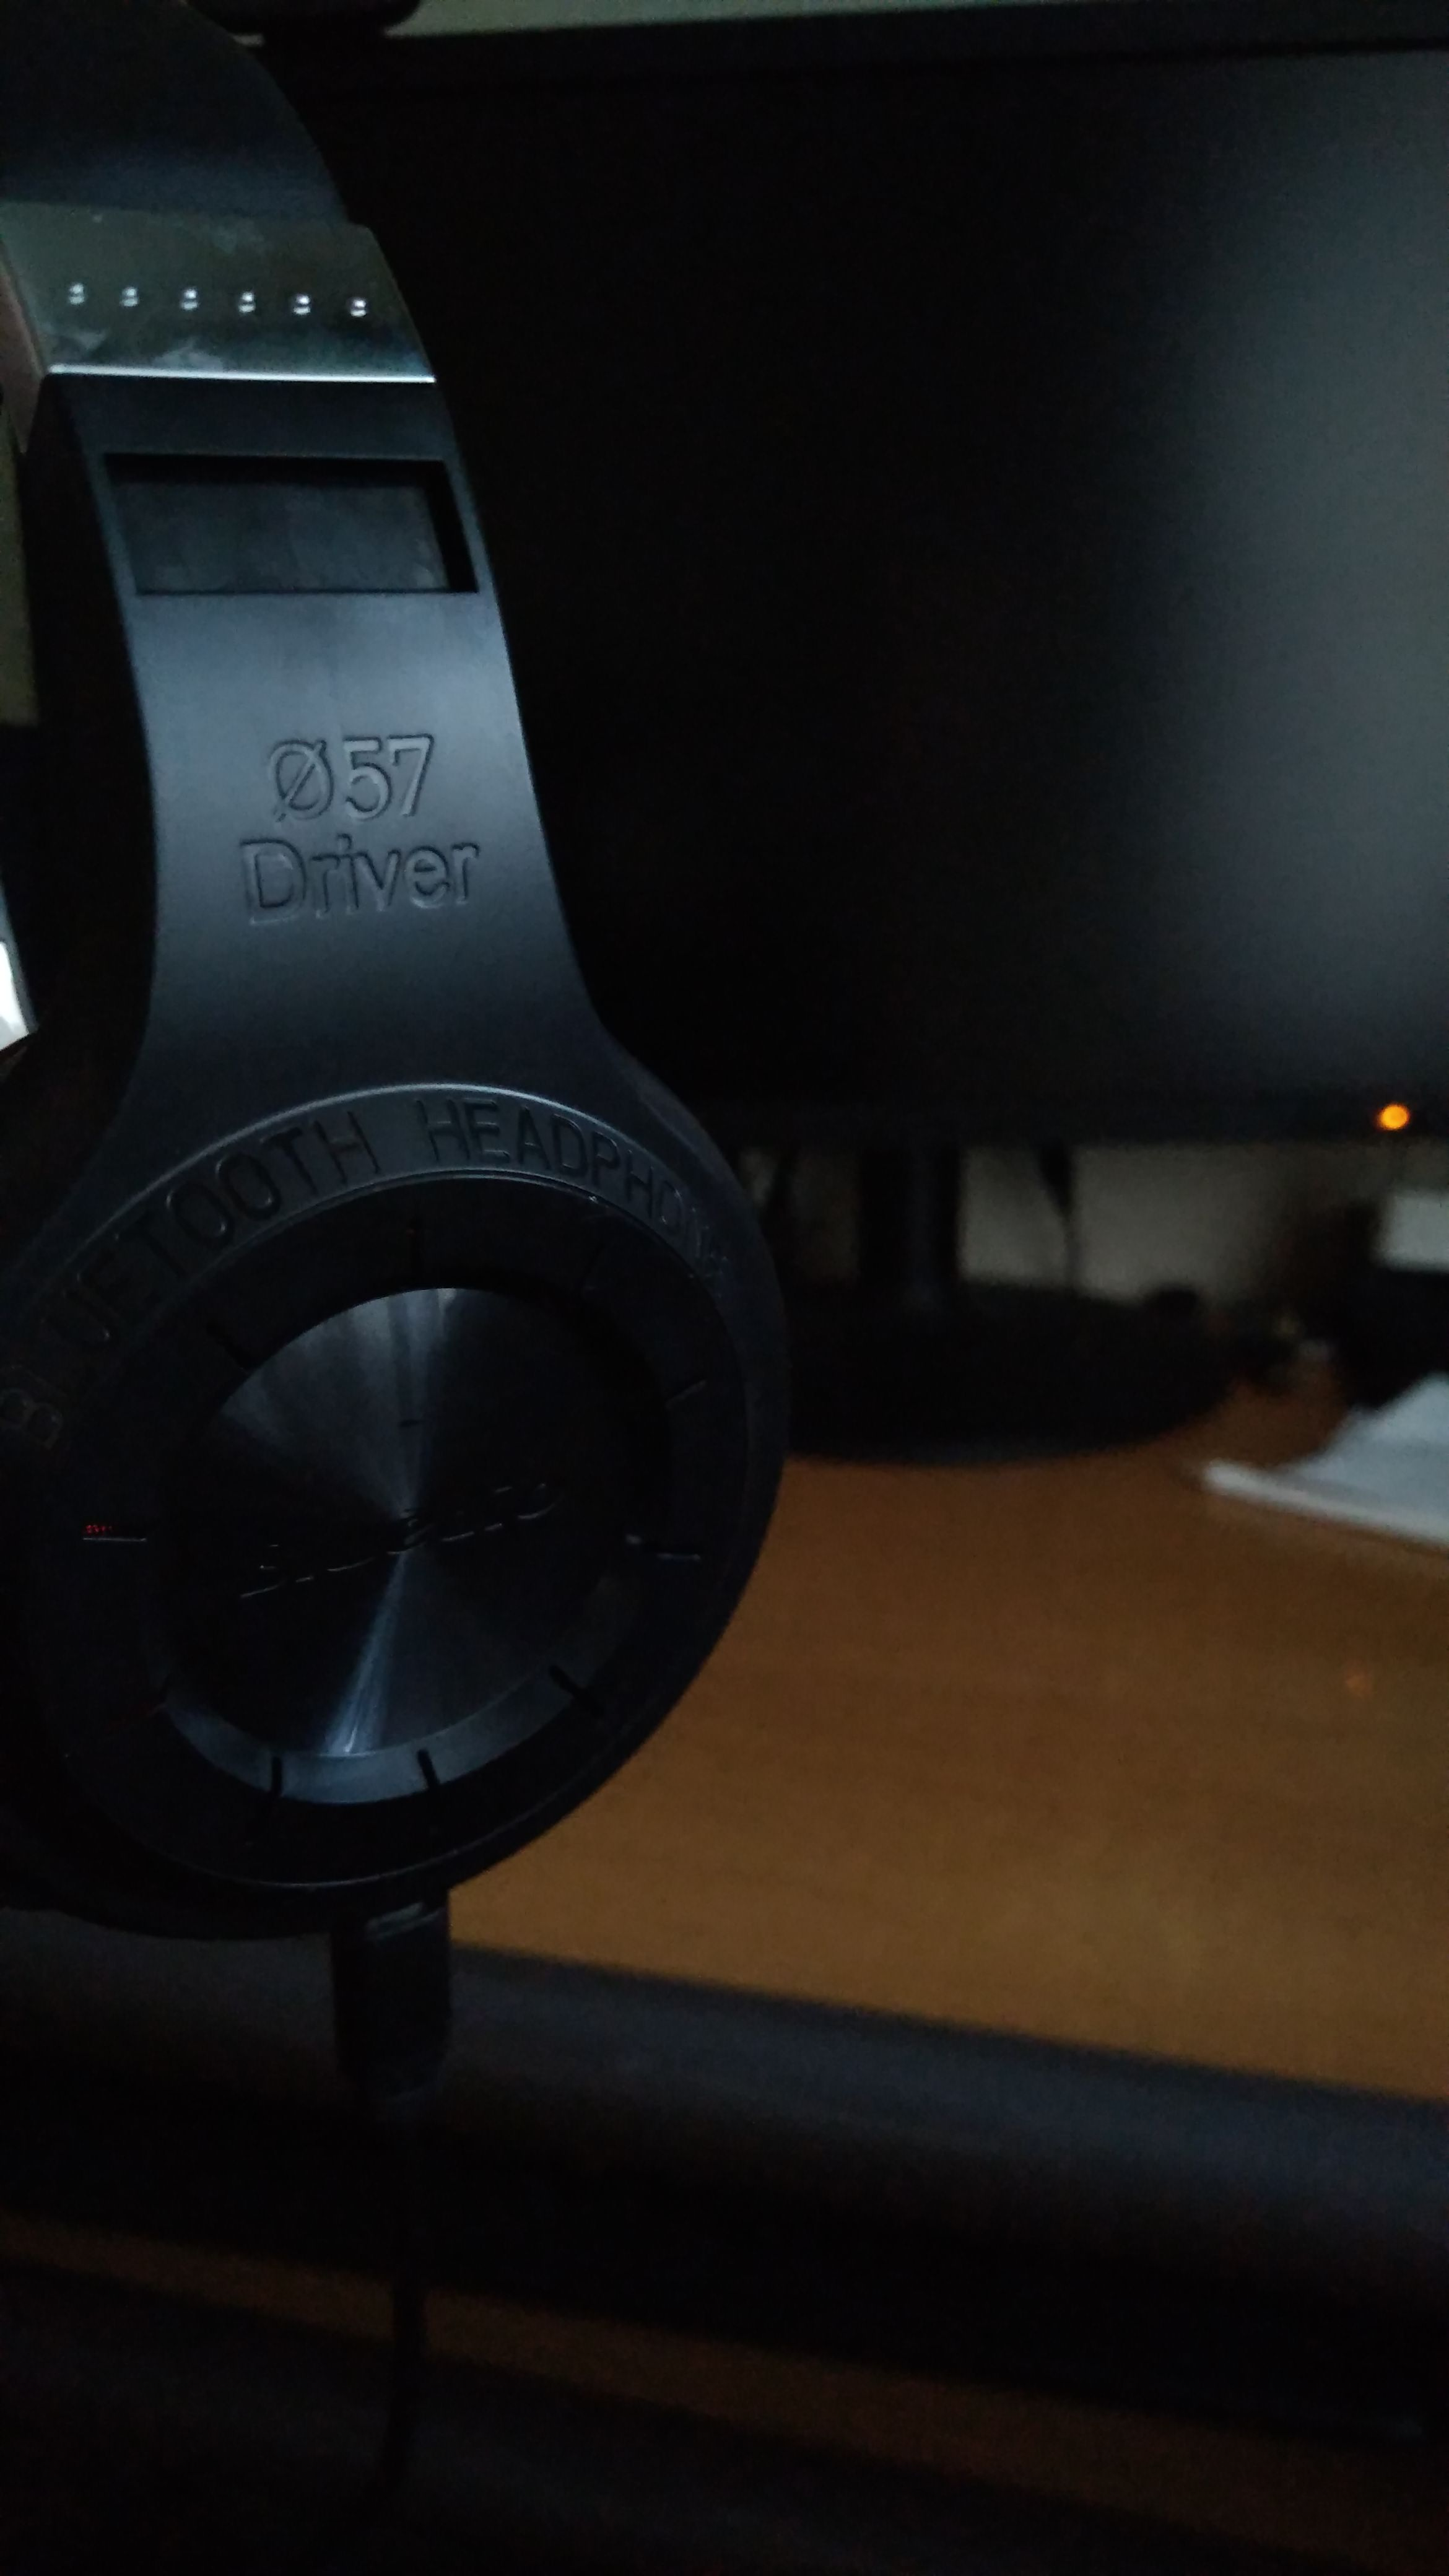 Original Bluedio H+ Bluetooth Stereo Wireless headphones Super Bass Music Mp3 Player Headset with Mic FM BT5.0 headphones|stereo wireless headphones|wireless headphonesbluetooth stereo wireless headphones - AliExpress